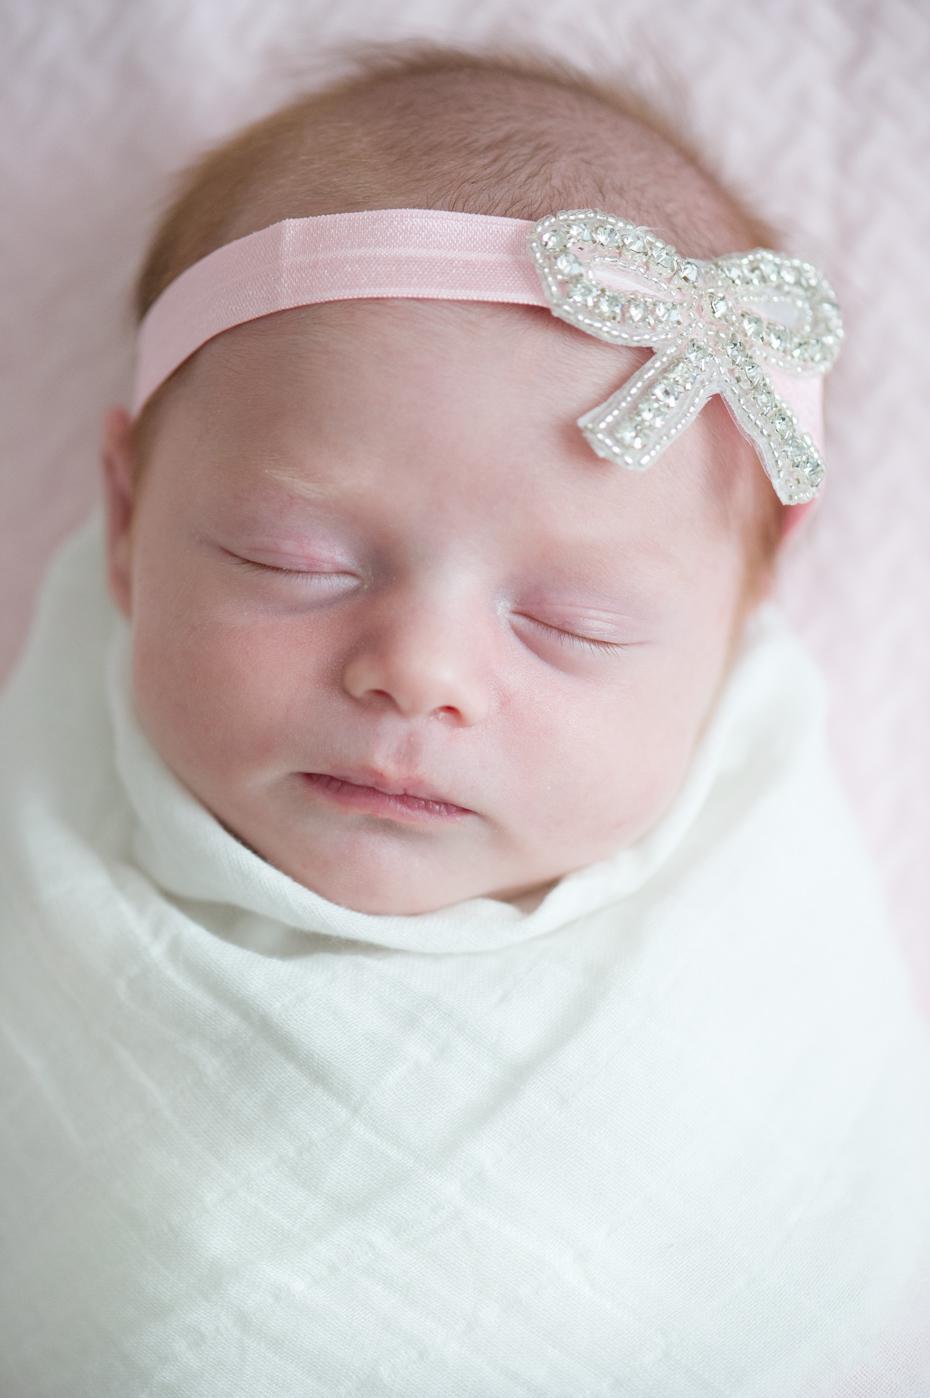 Newborn photo with bow